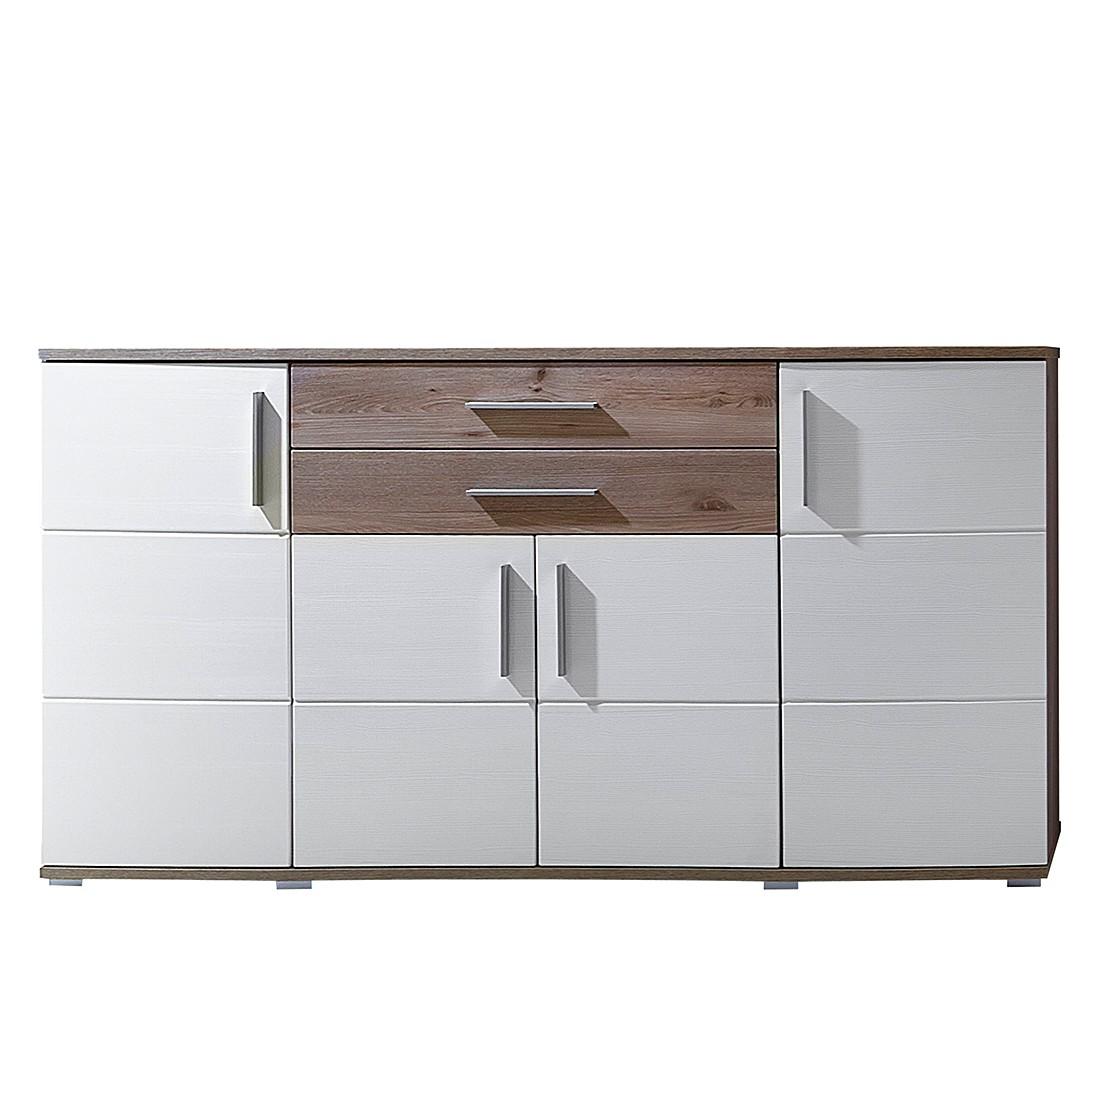 sideboard 50 cm tief sonstige preisvergleiche. Black Bedroom Furniture Sets. Home Design Ideas